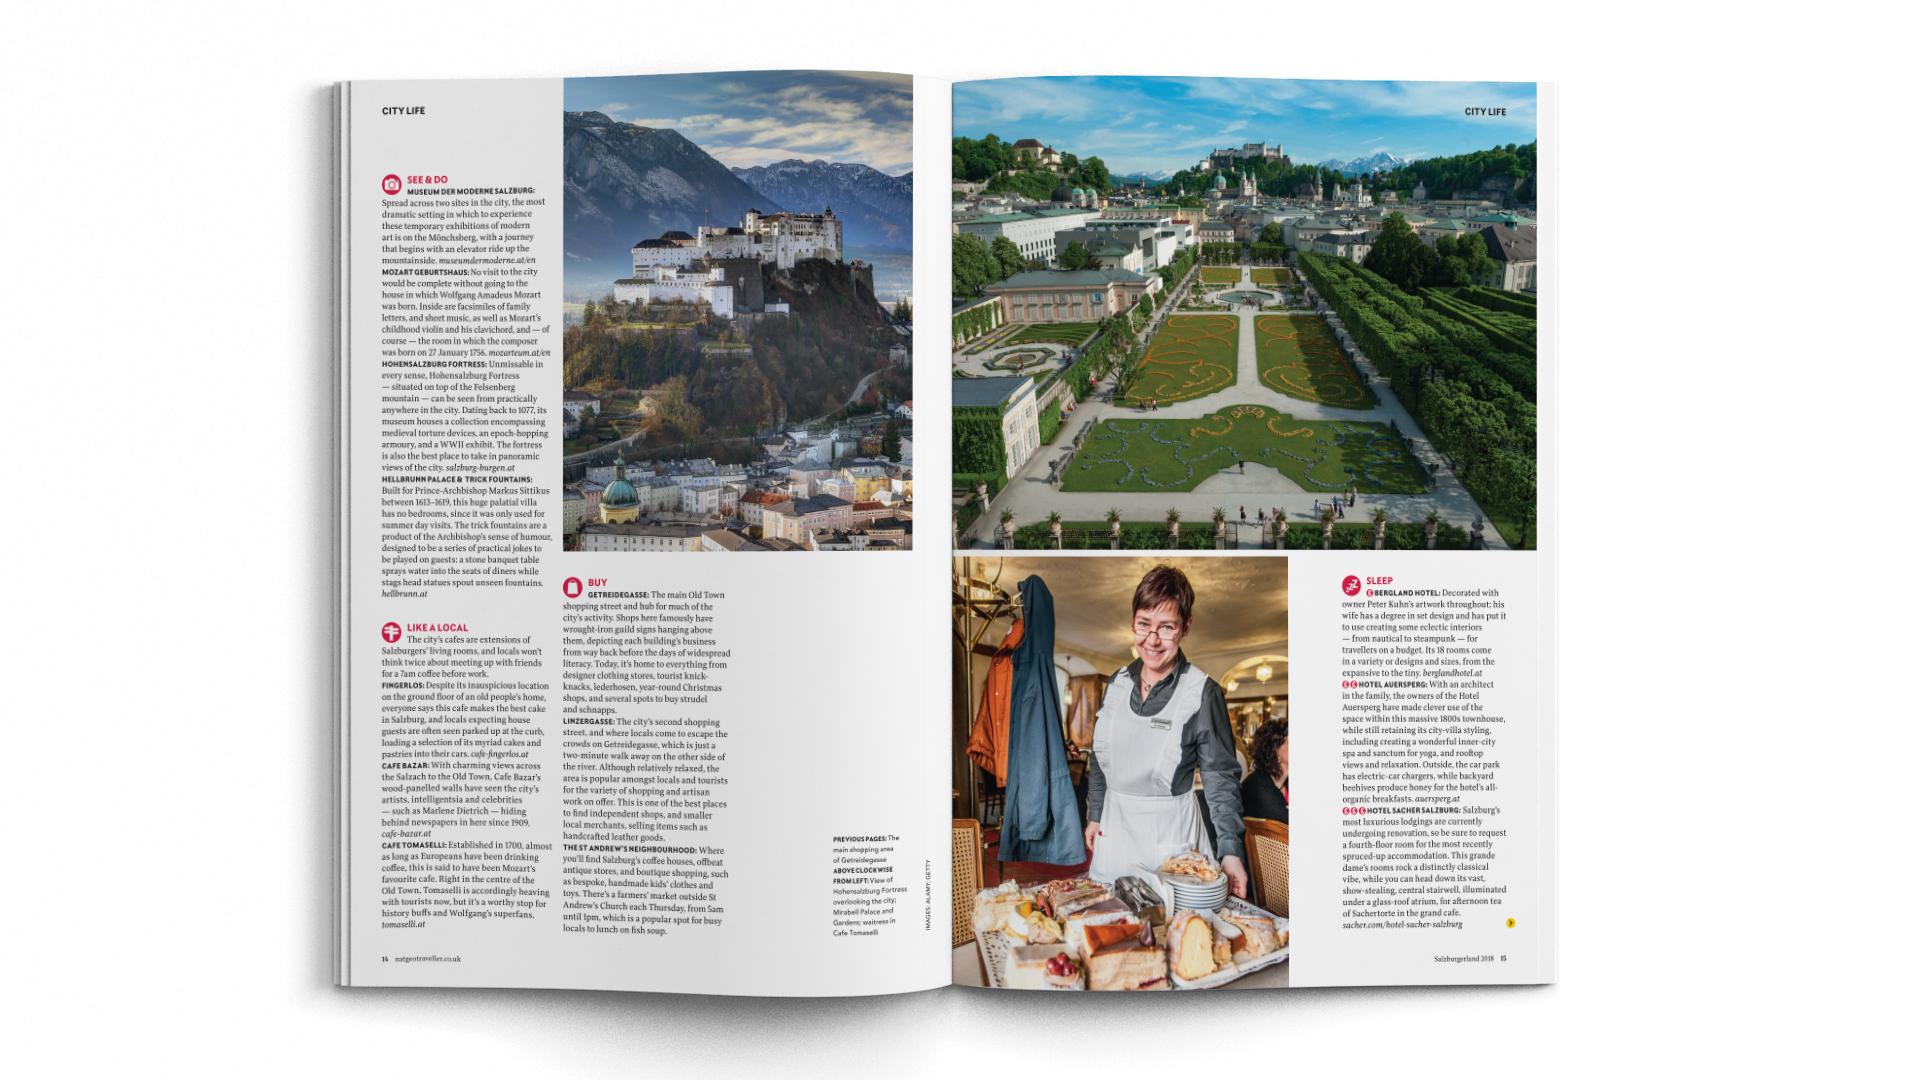 A4-Magazine-DPS-NGT-SALZ-City-Life-1